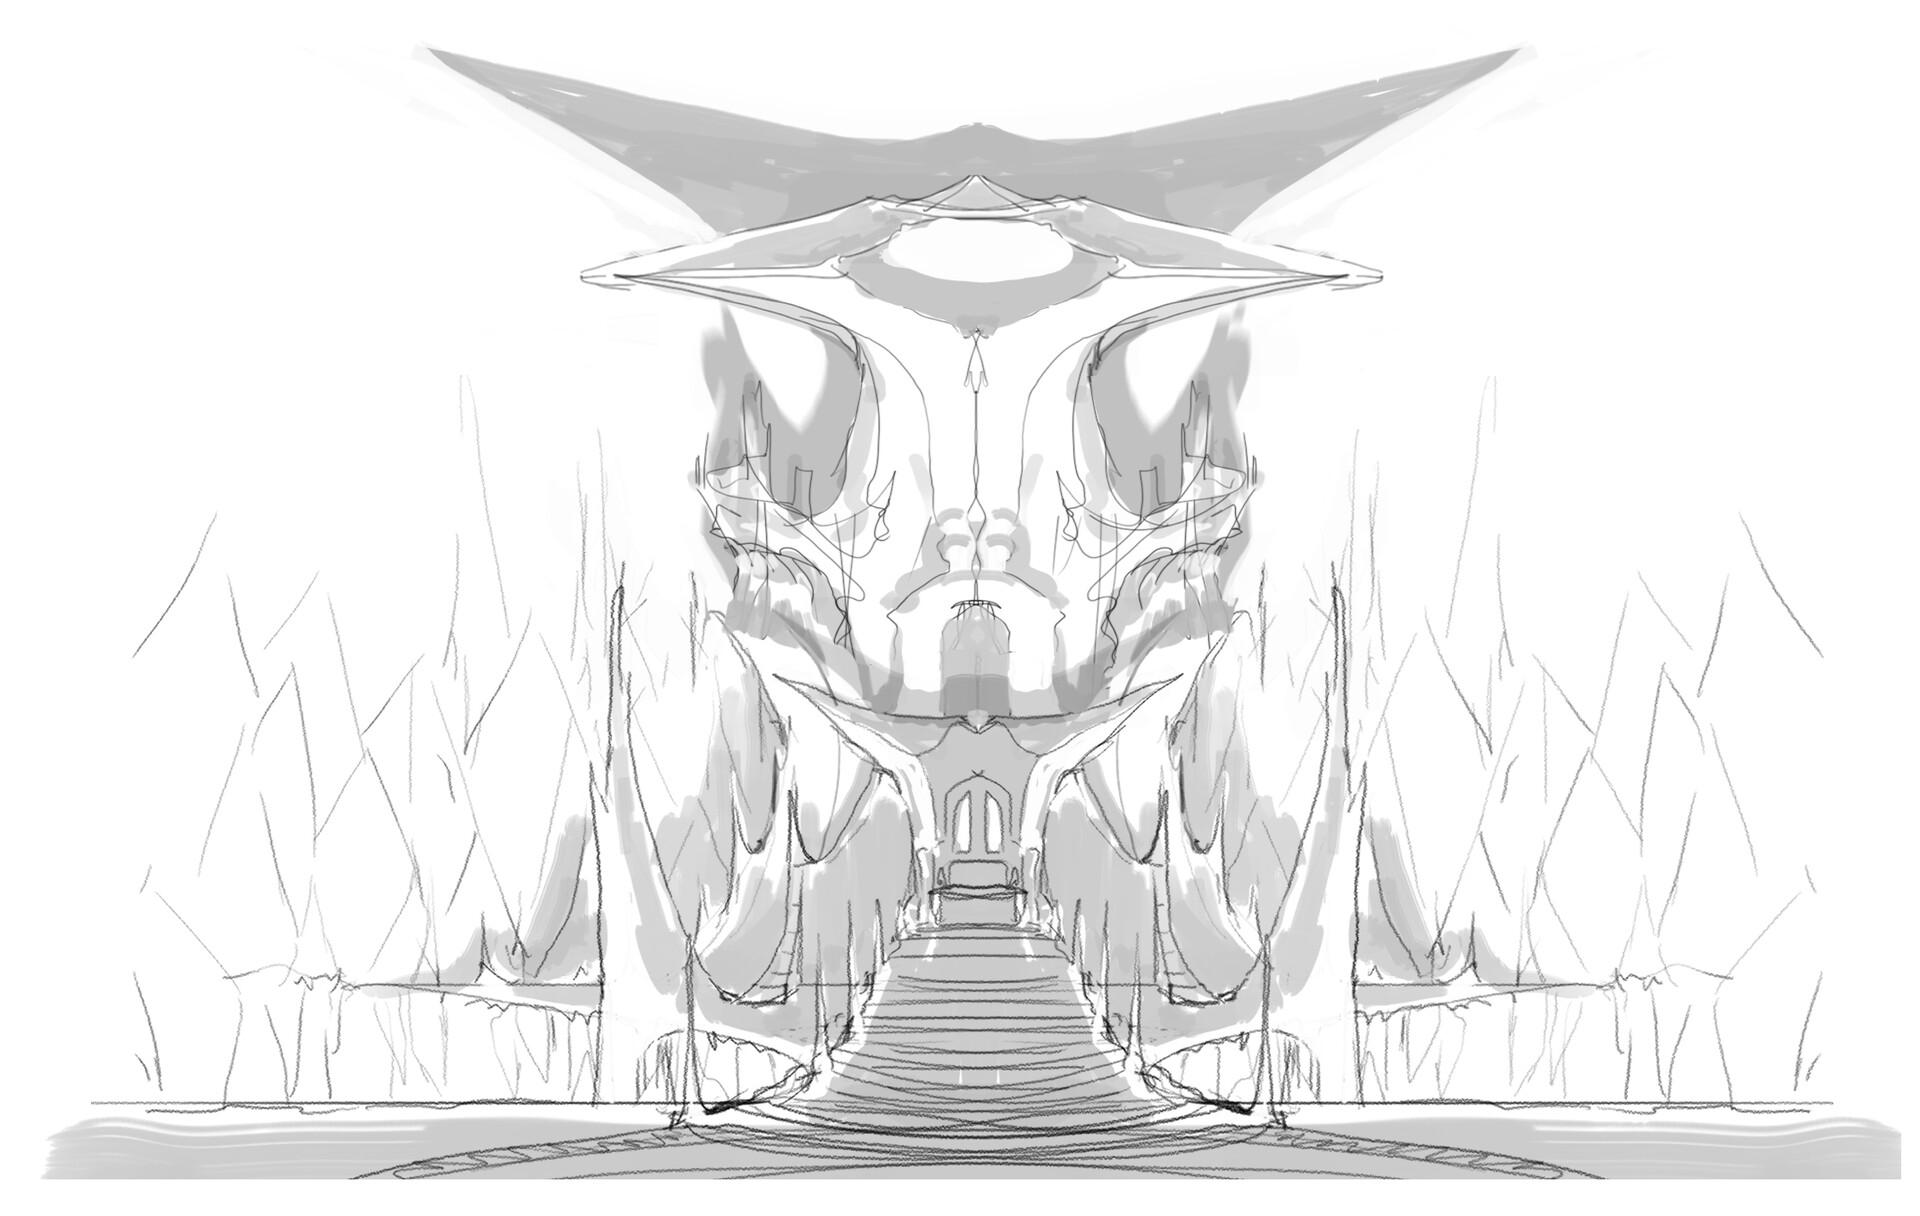 First sketch.